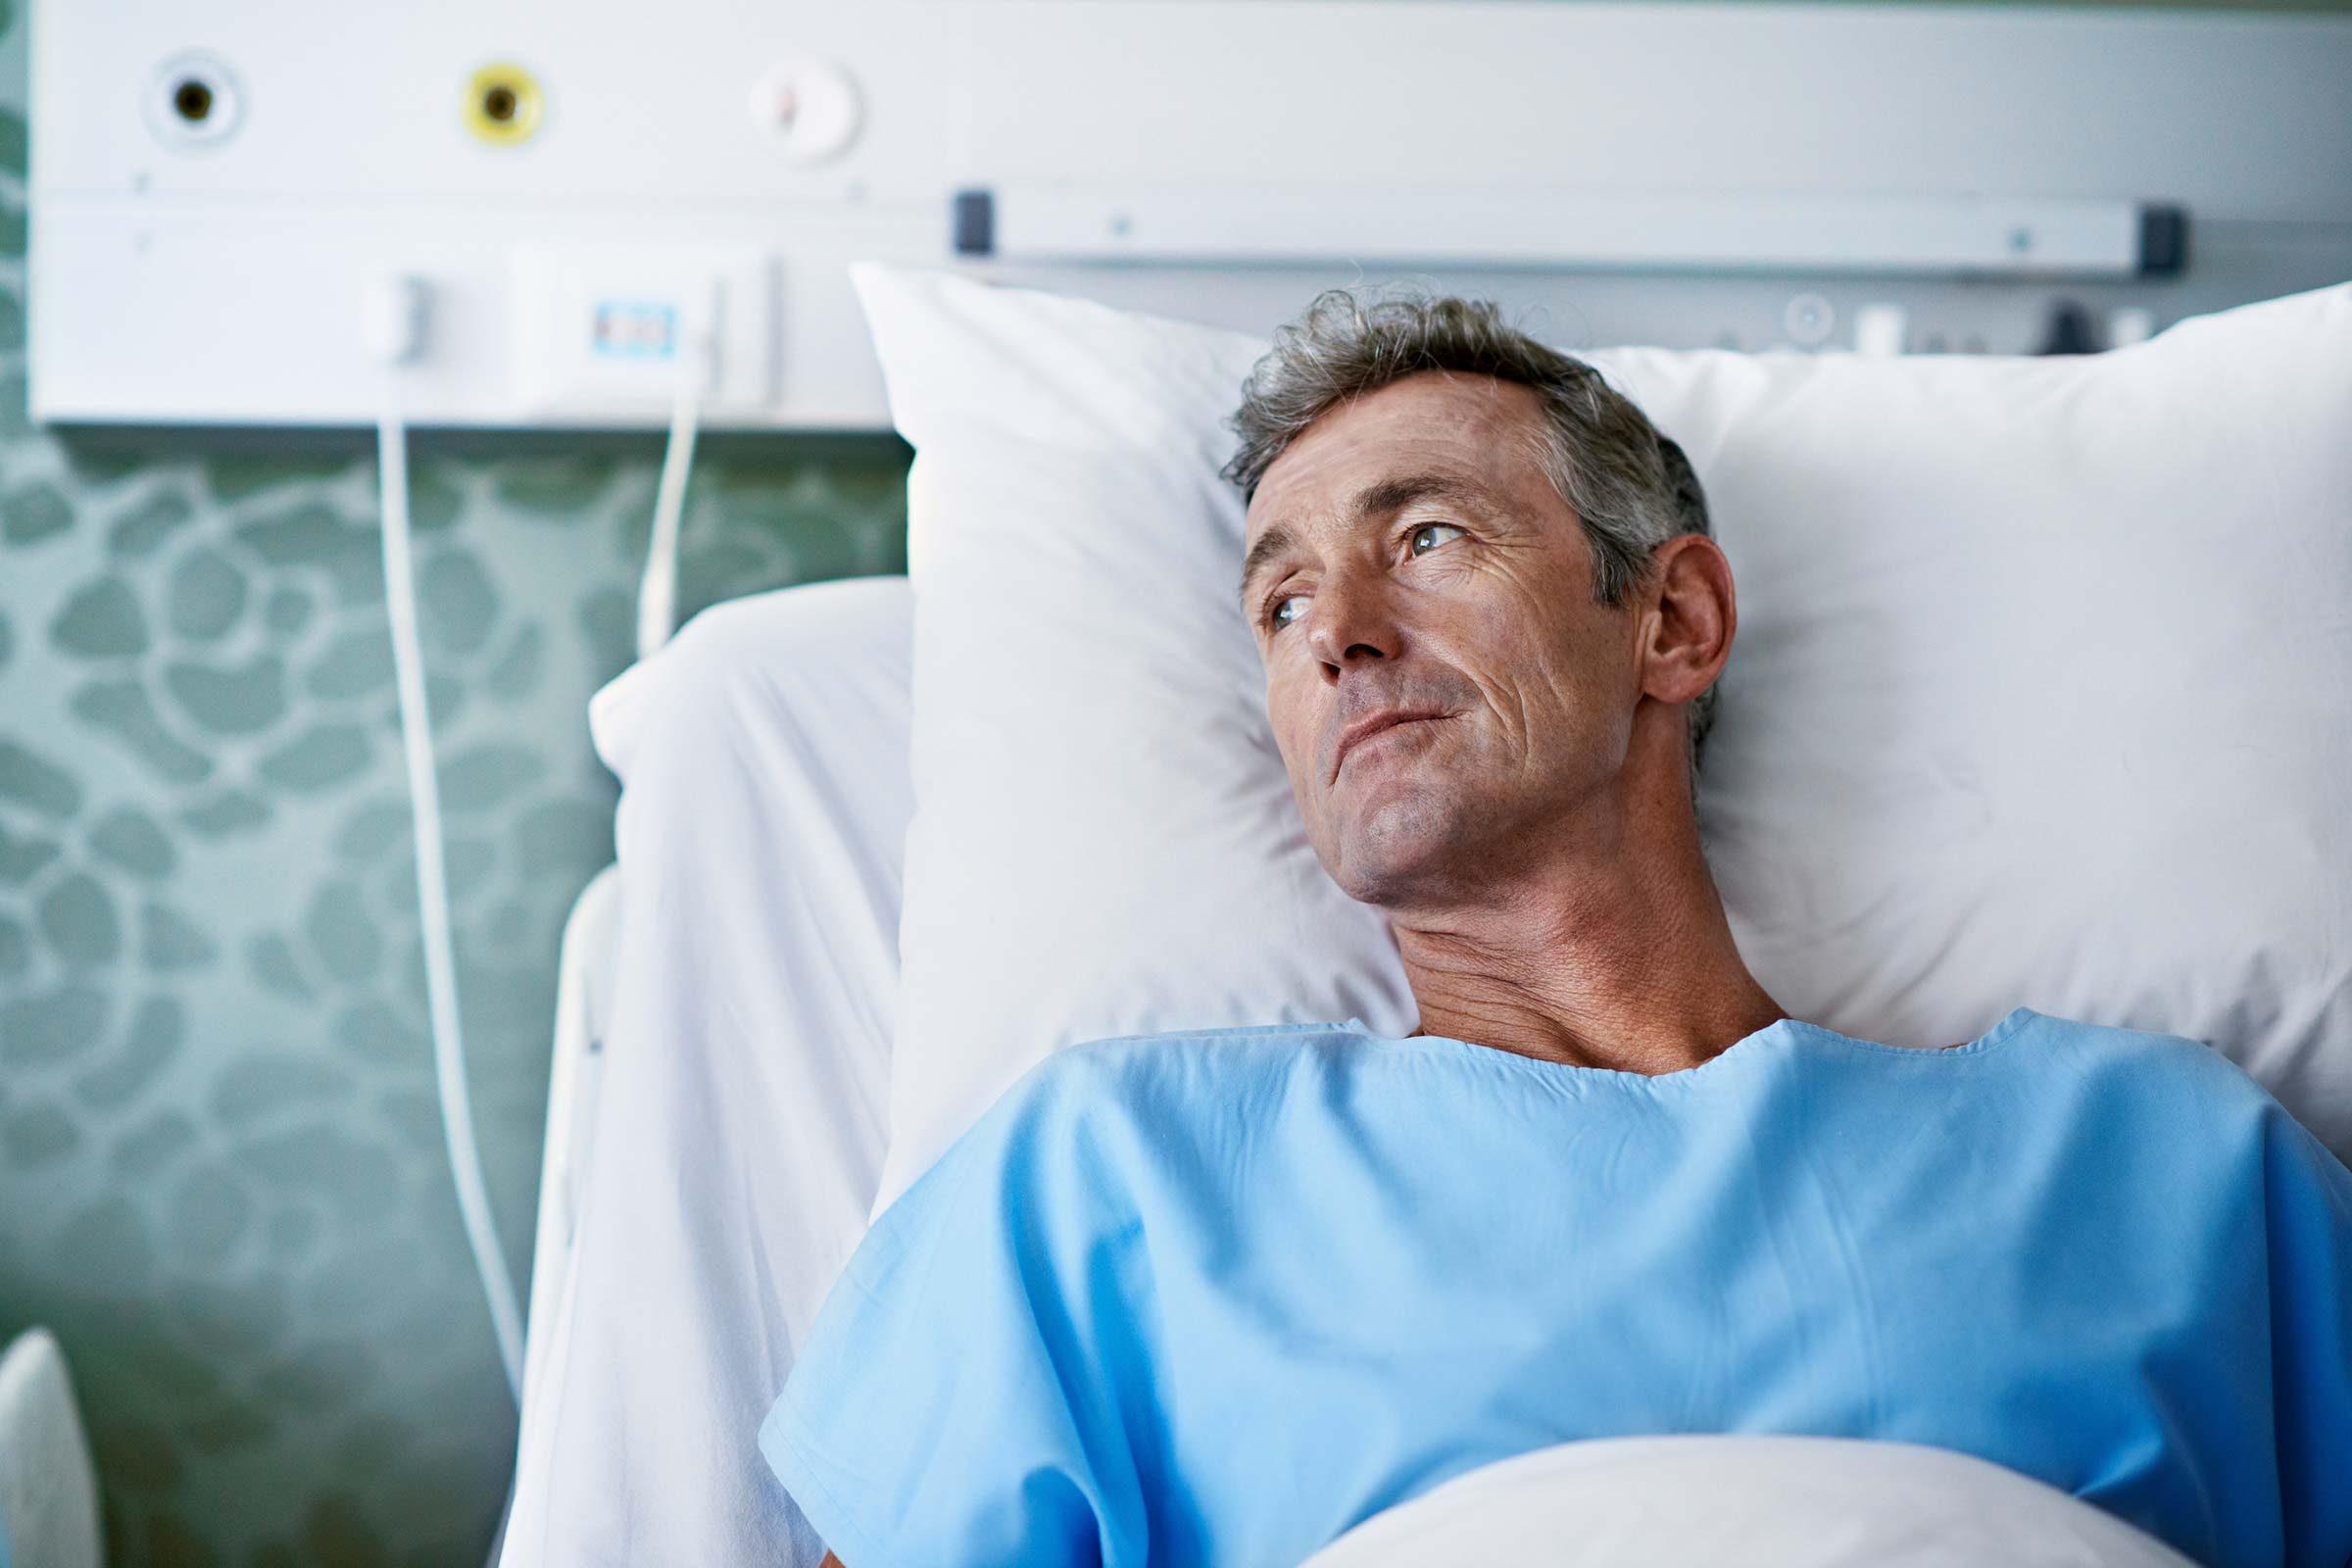 Woman Makes Emergency Room Sick